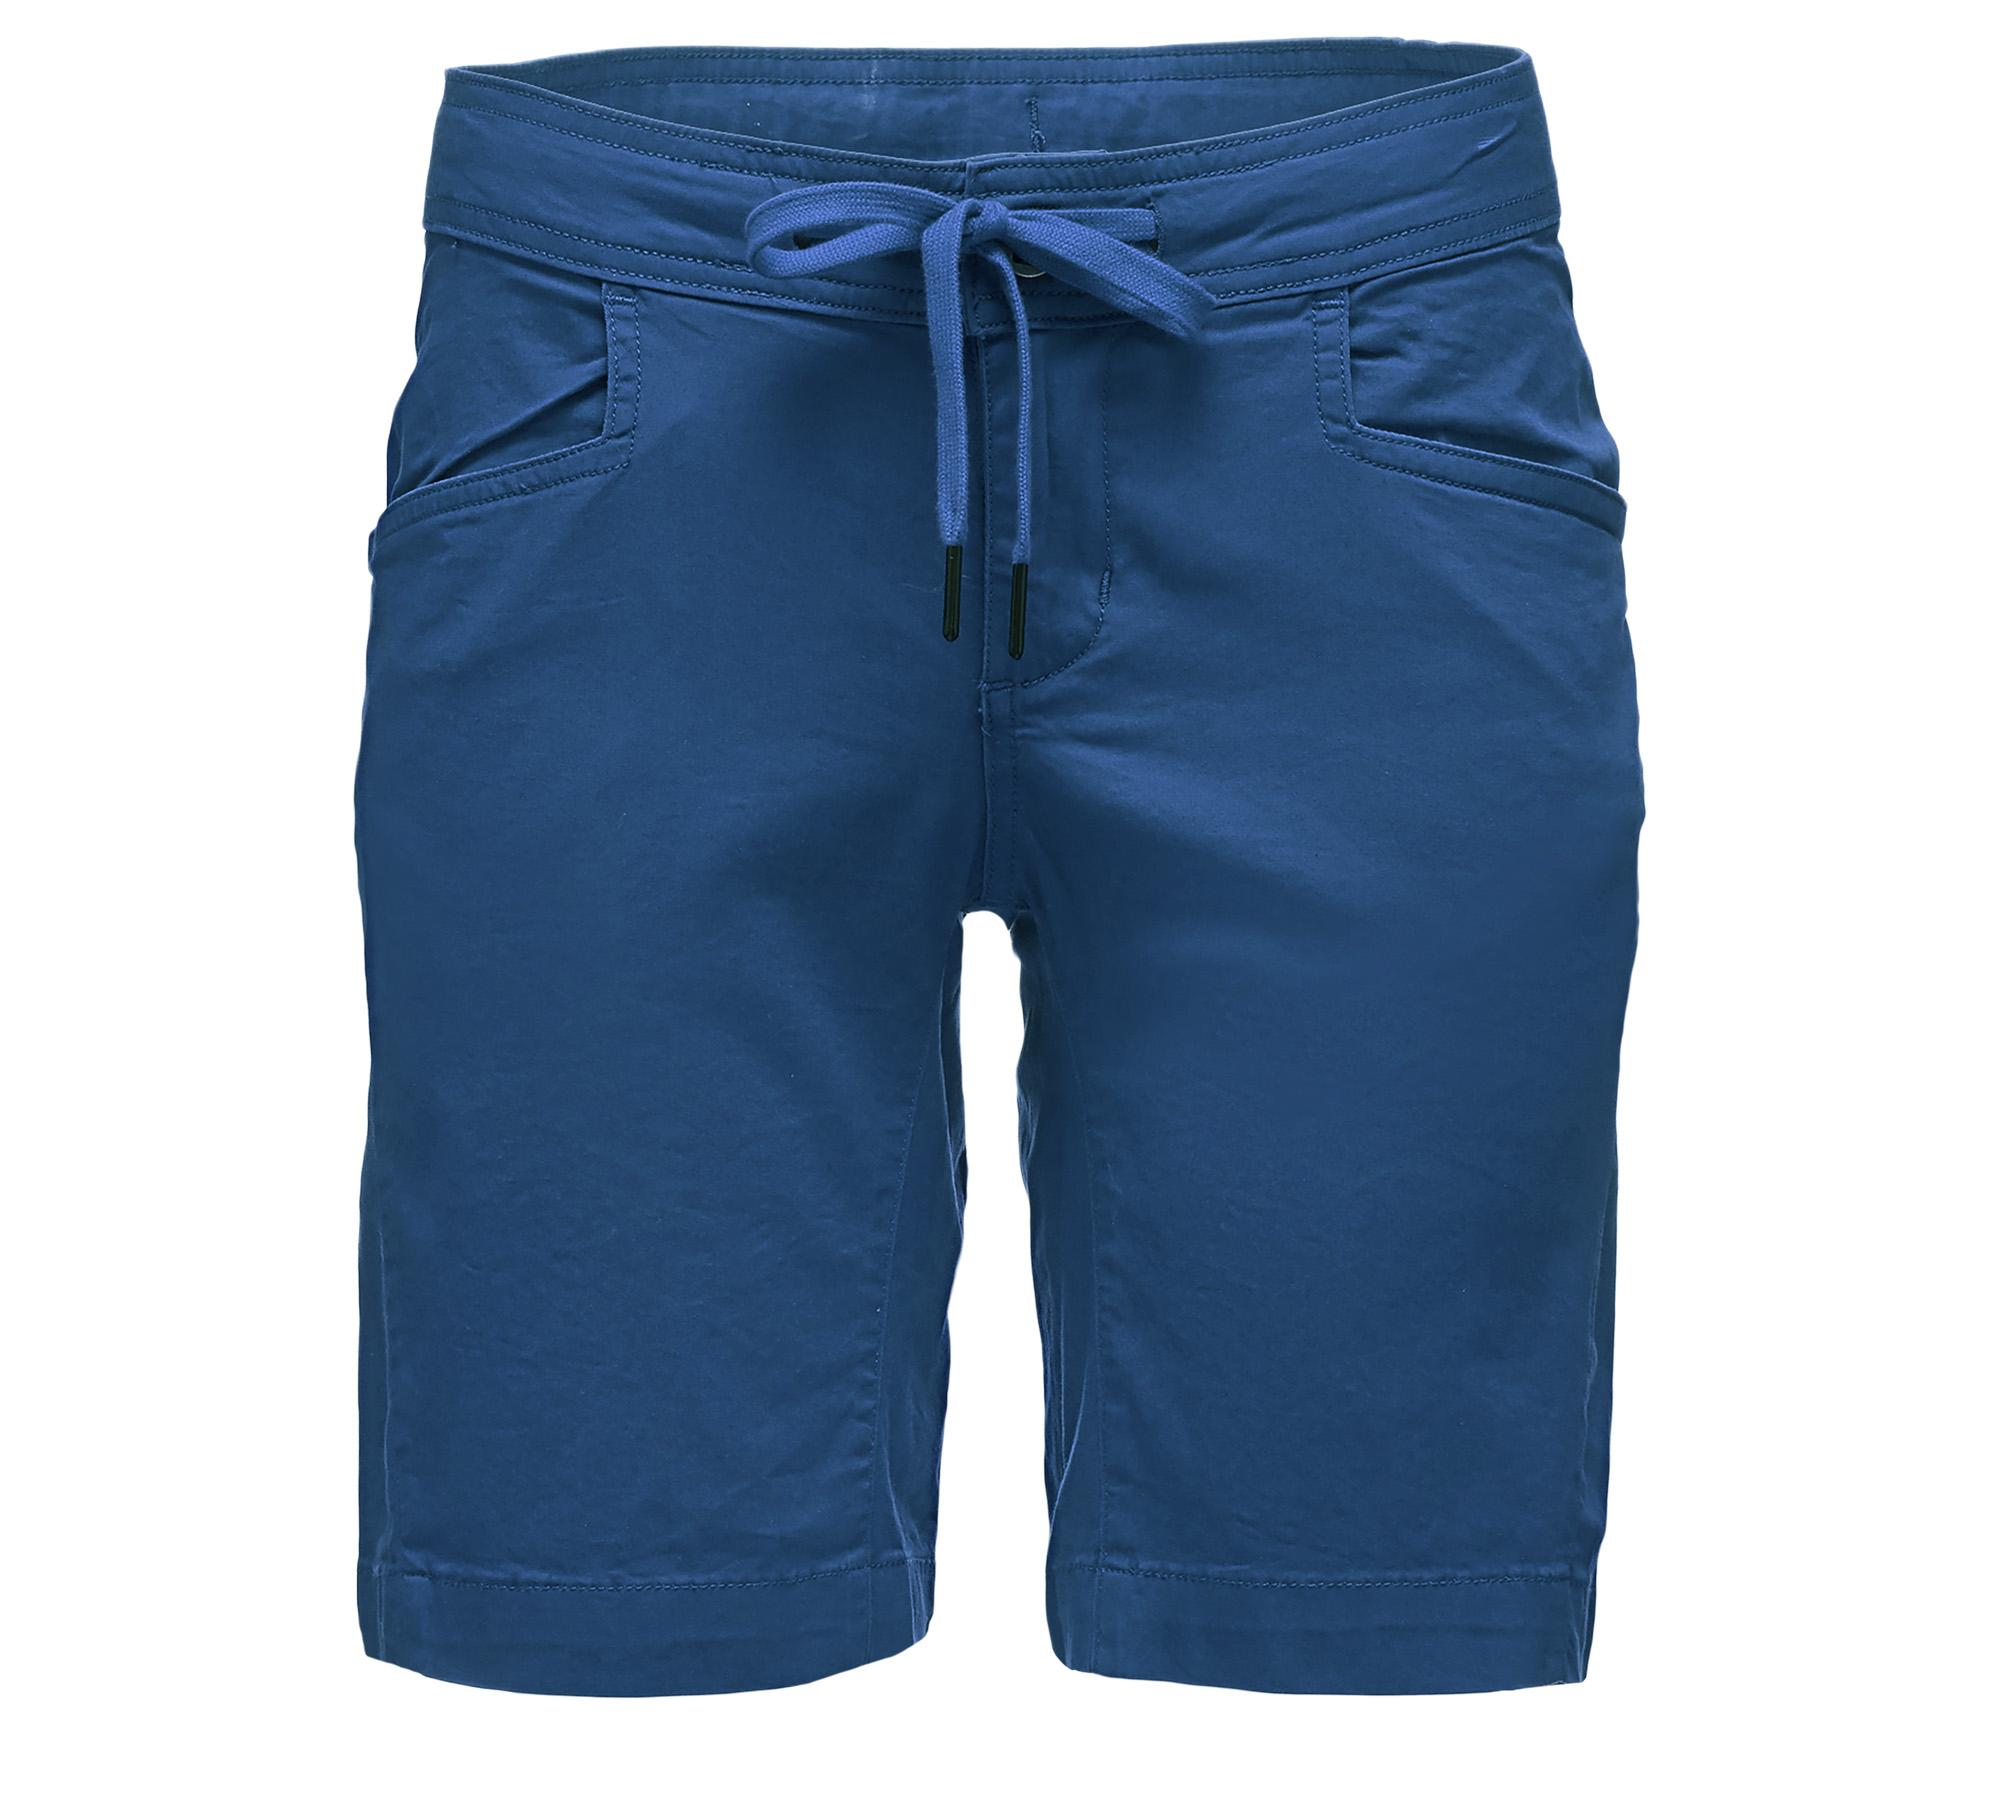 Black Diamond Credo Shorts - Klettershorts - Damen